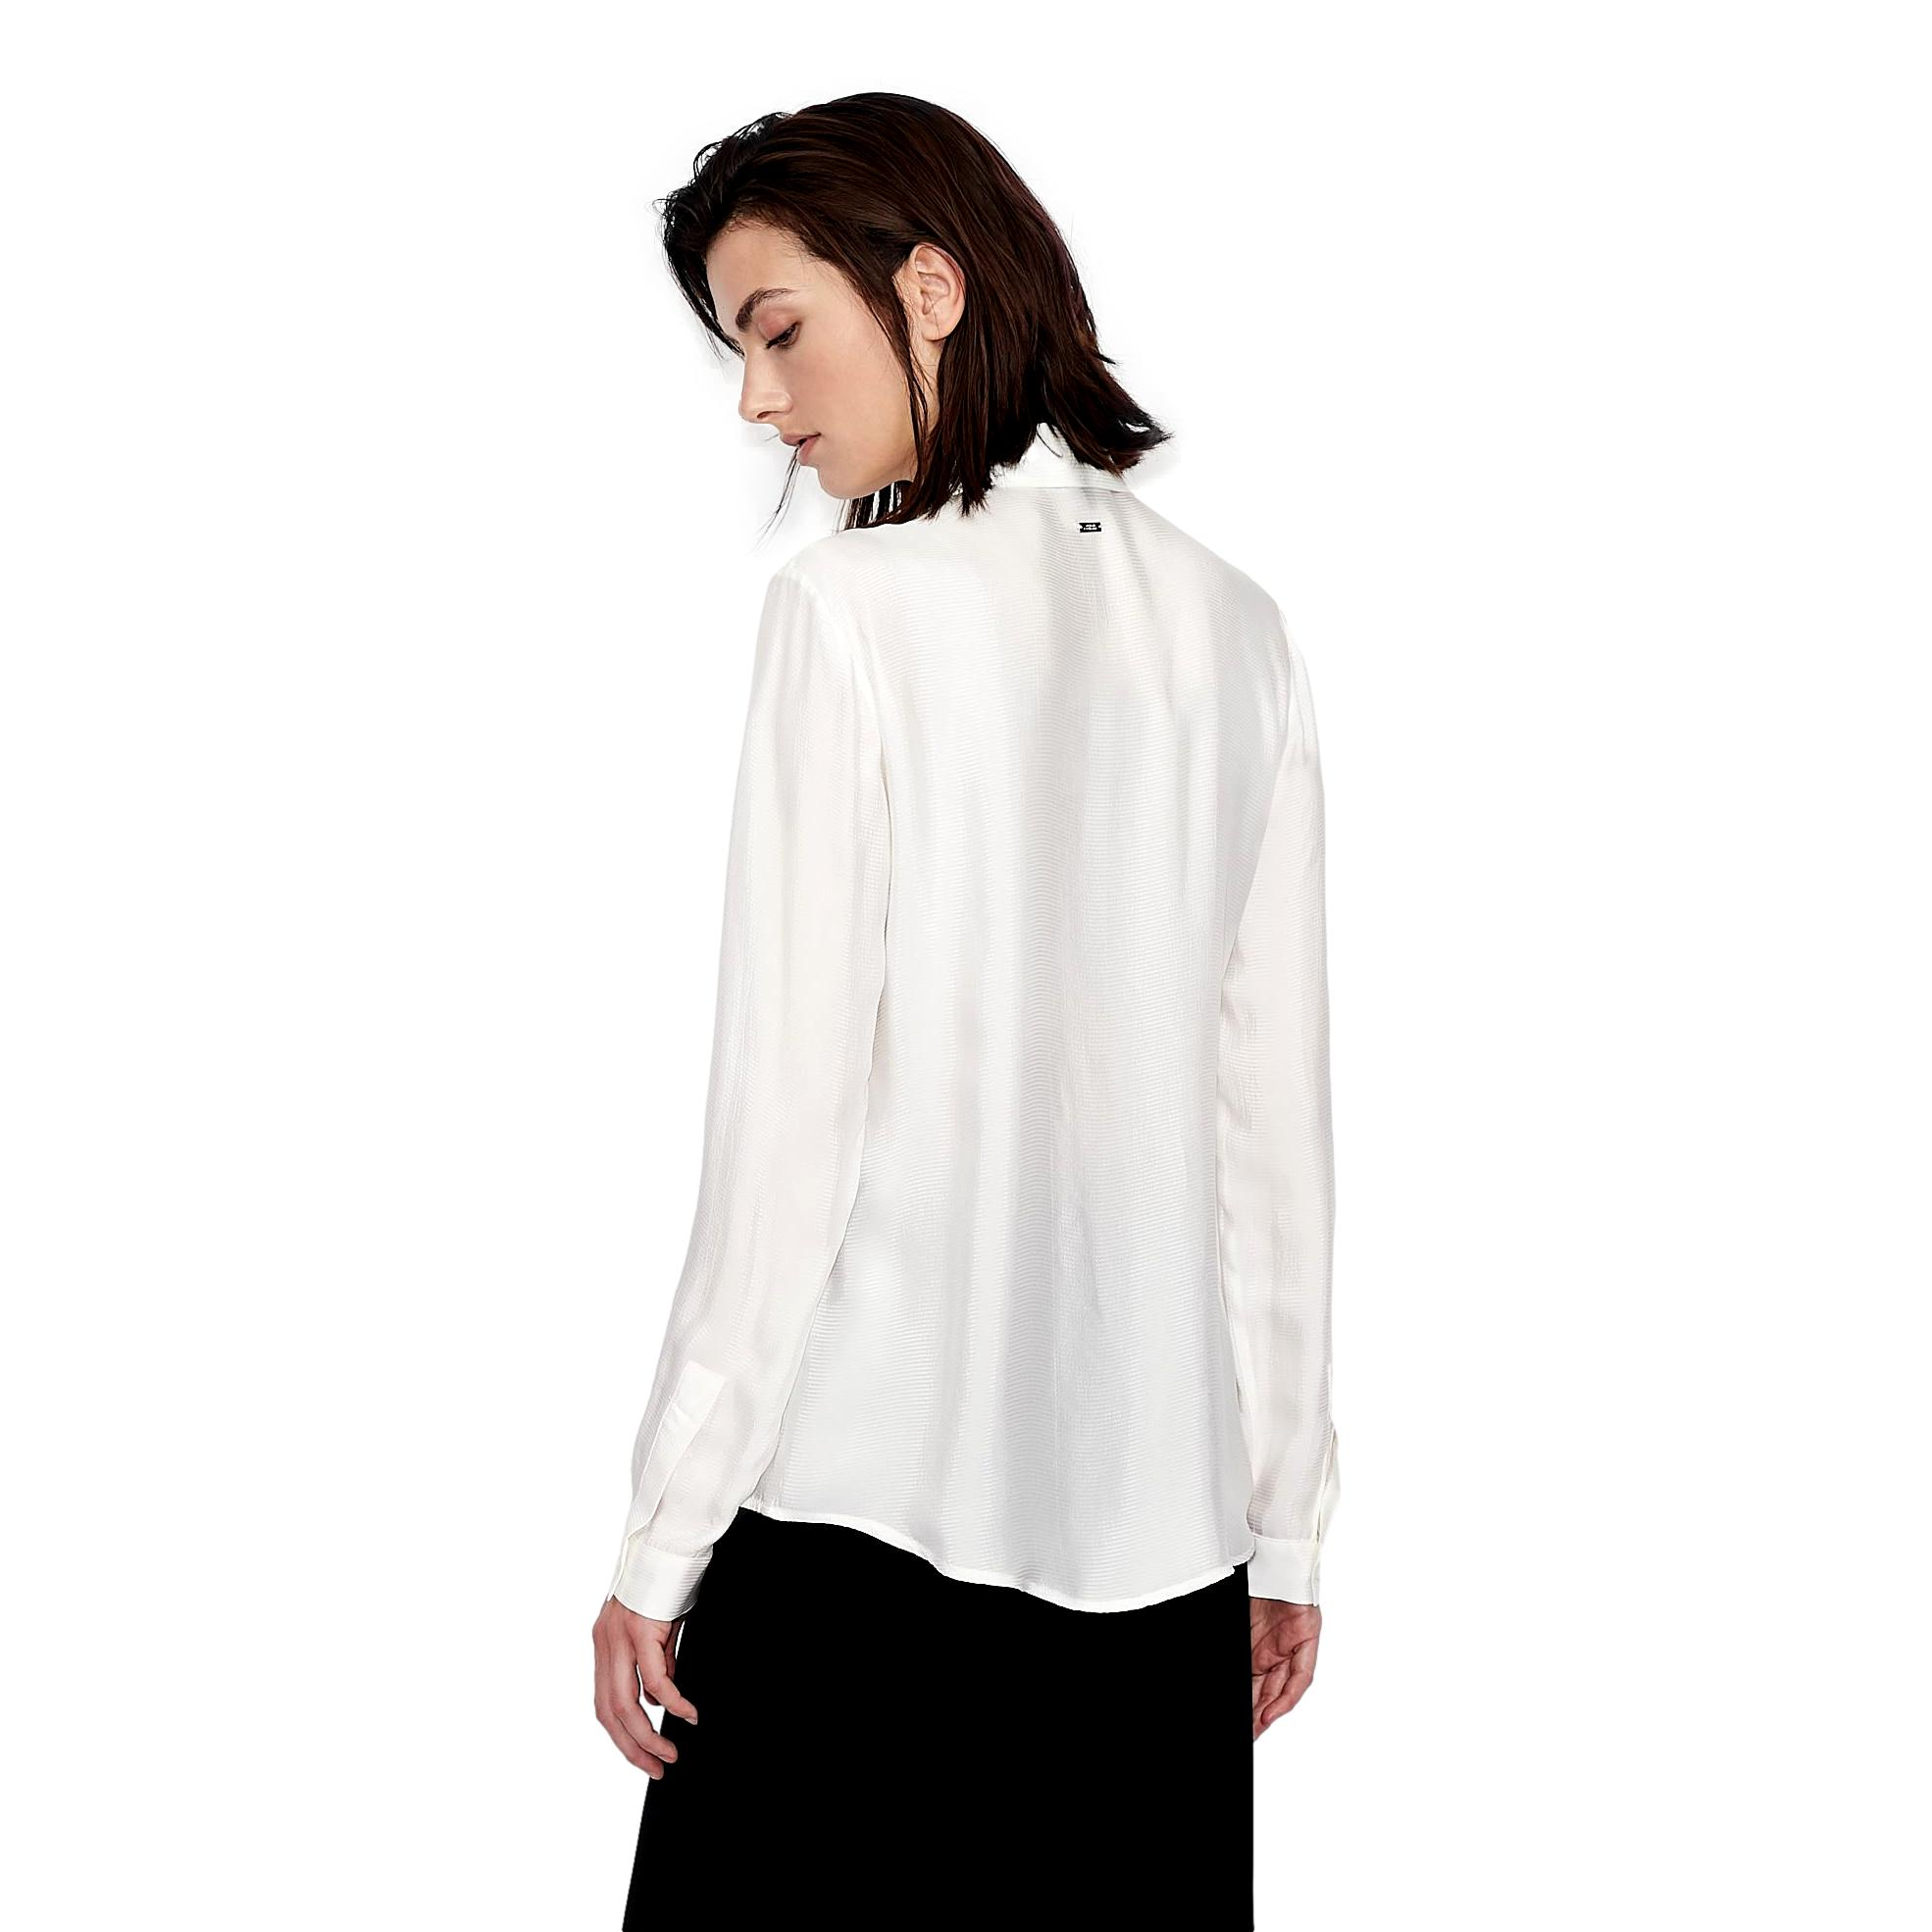 Solid Color Shirt ARMANI EXCHANGE |  | 8NYC60 YNQWZ1100